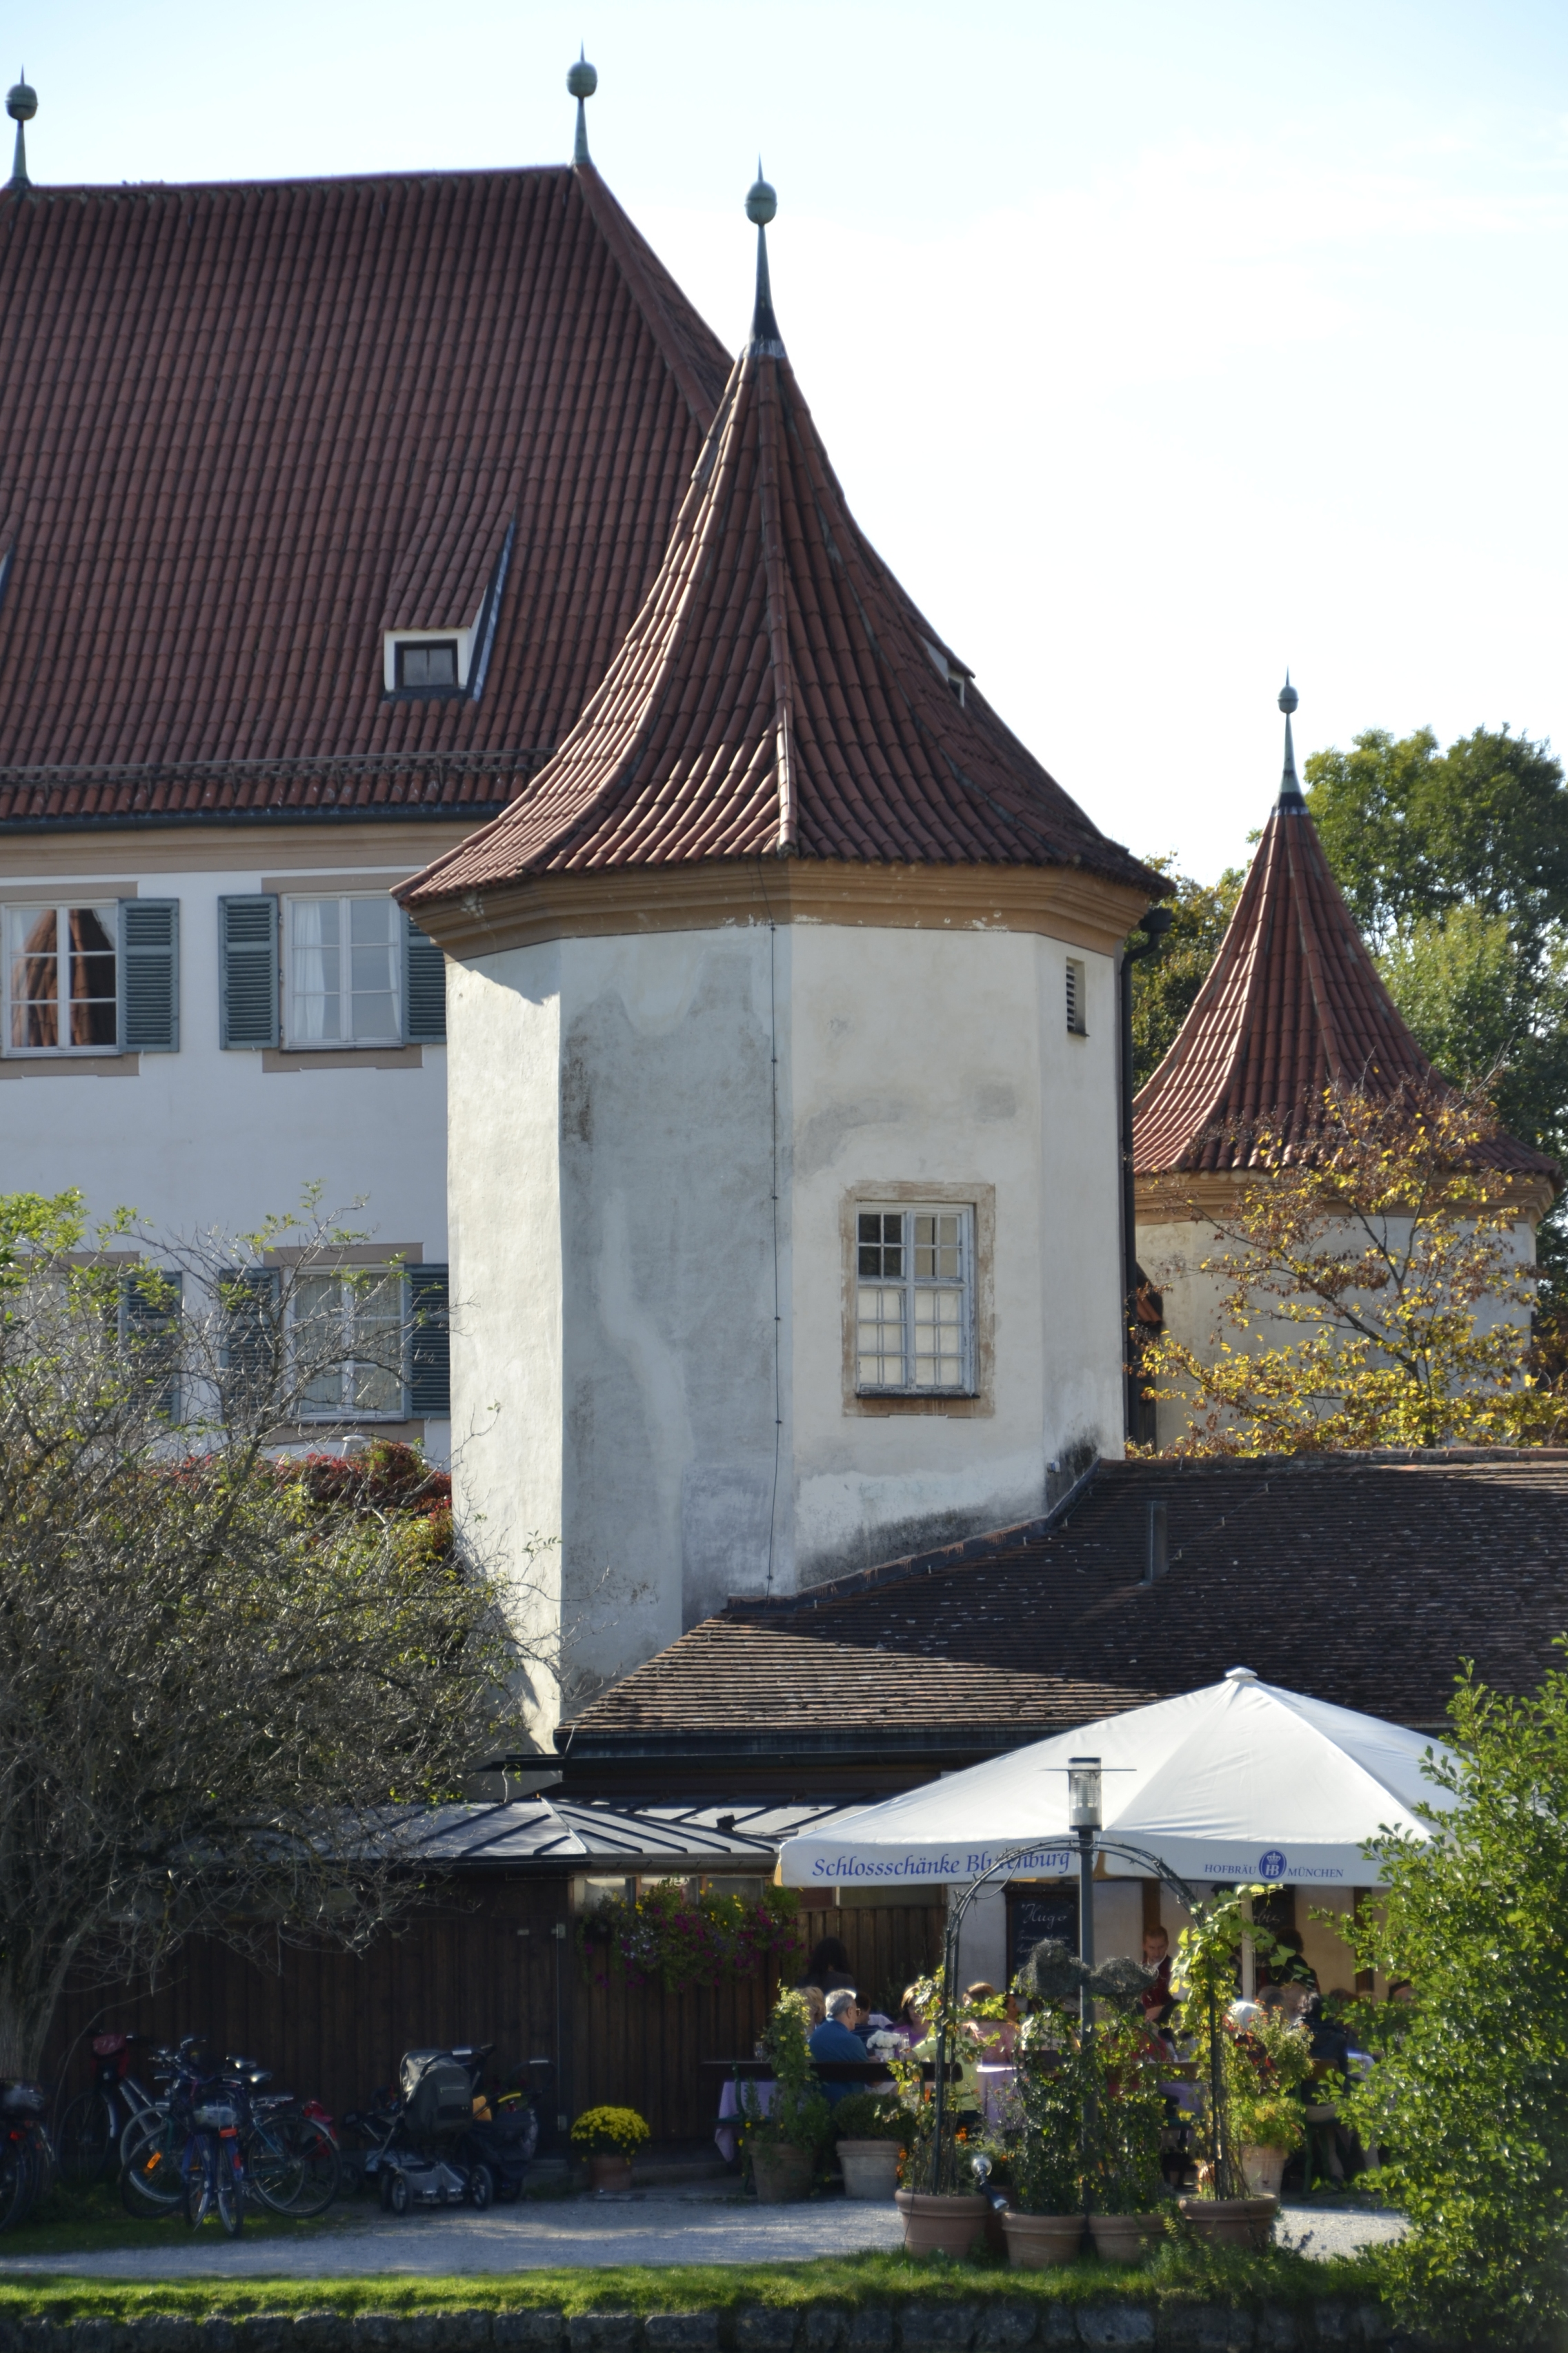 File:Schloss Blutenburg - Turm bei der Gaststätte.JPG - Wikimedia ...